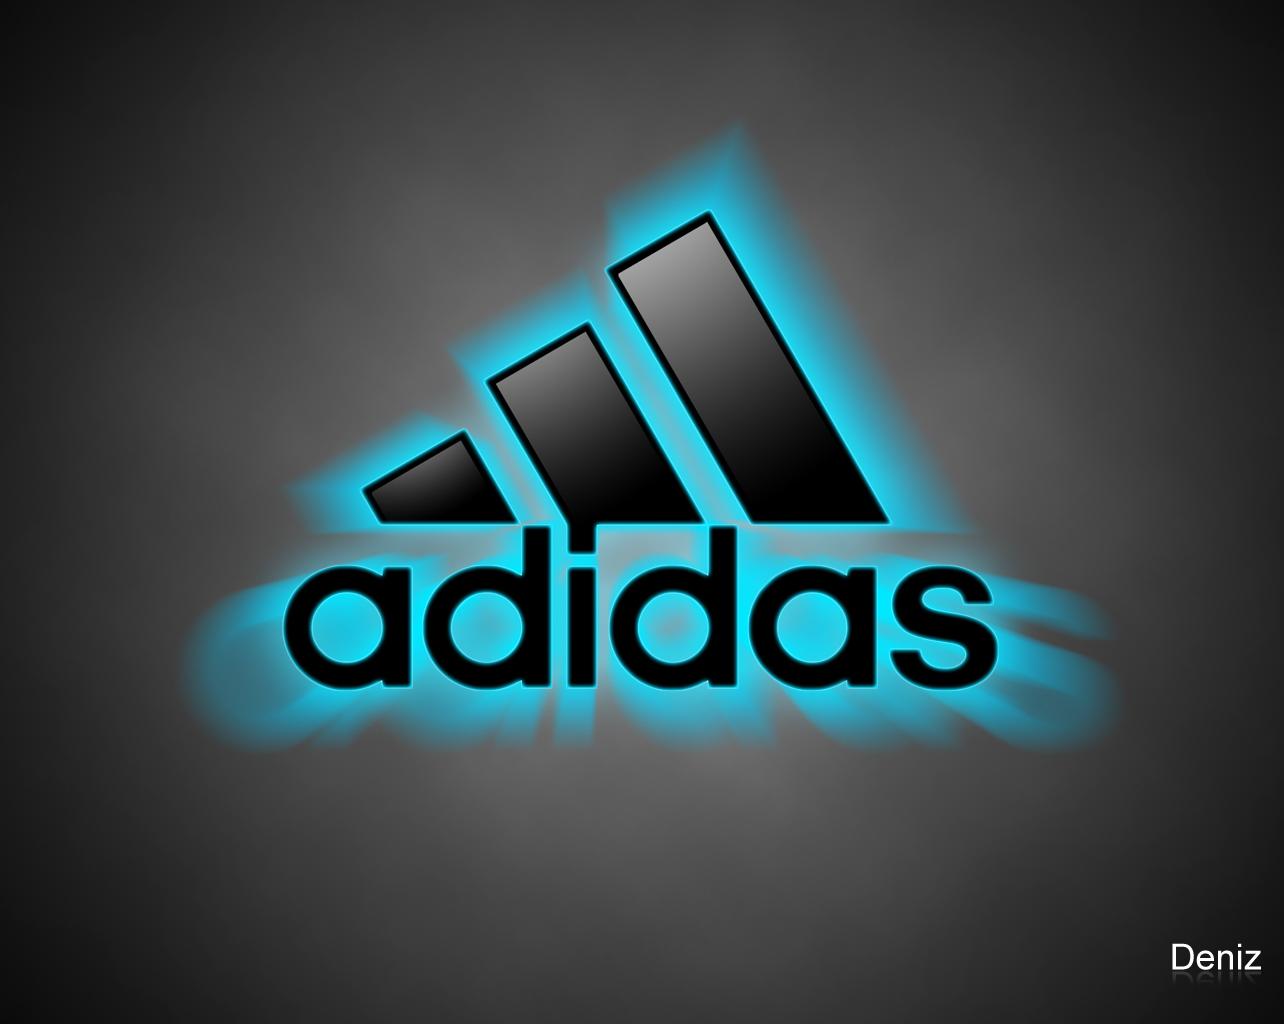 Pics Photos Adidas Soccer Wallpaper 1284x1024